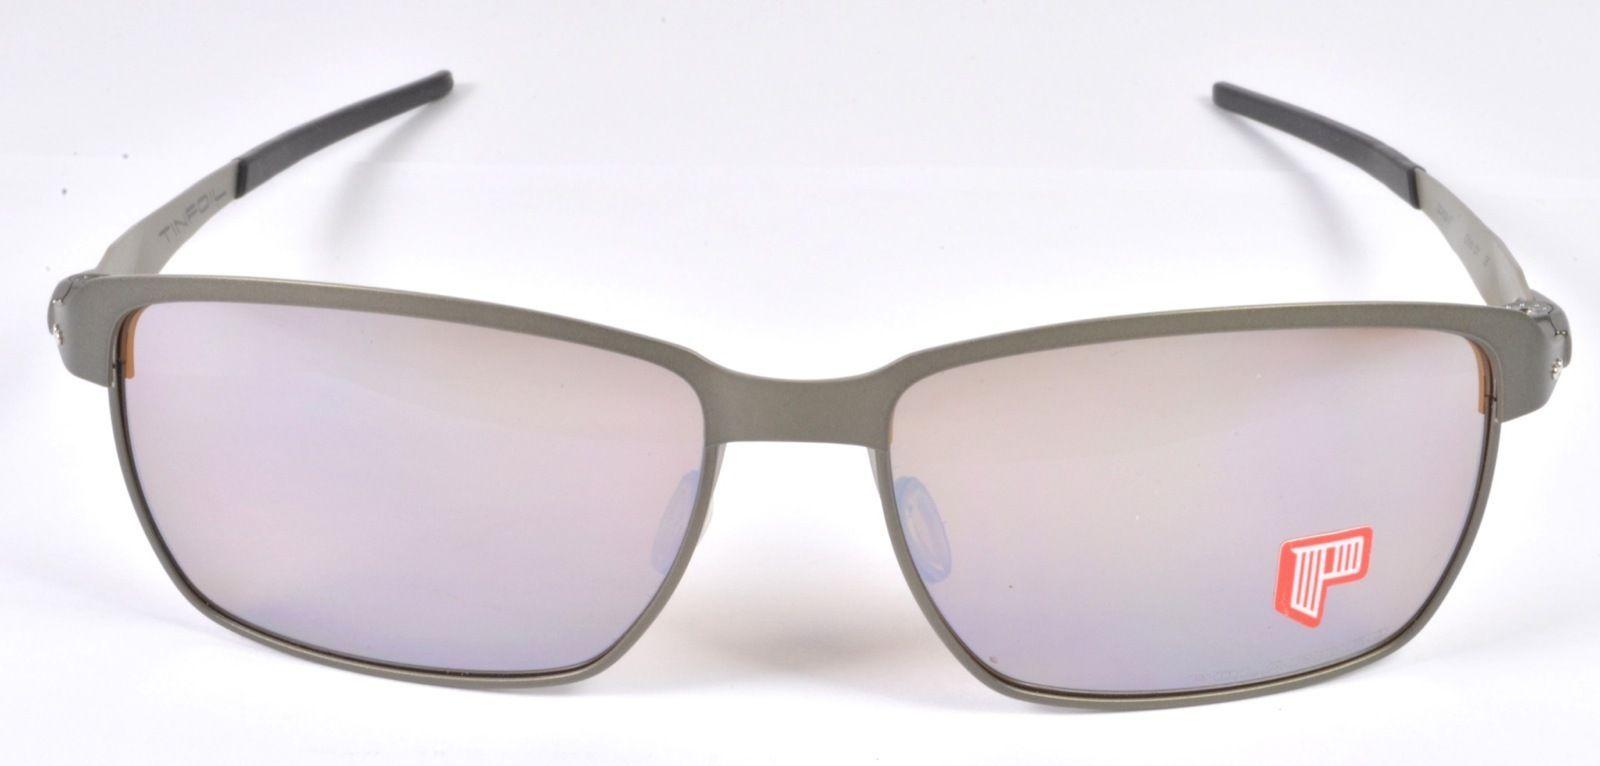 6ad2d6ca3f Oakley TINFOIL POLARIZED Mens Sunglasses - Carbon   Ti Iridium - OO4083-07  - Sunglasses